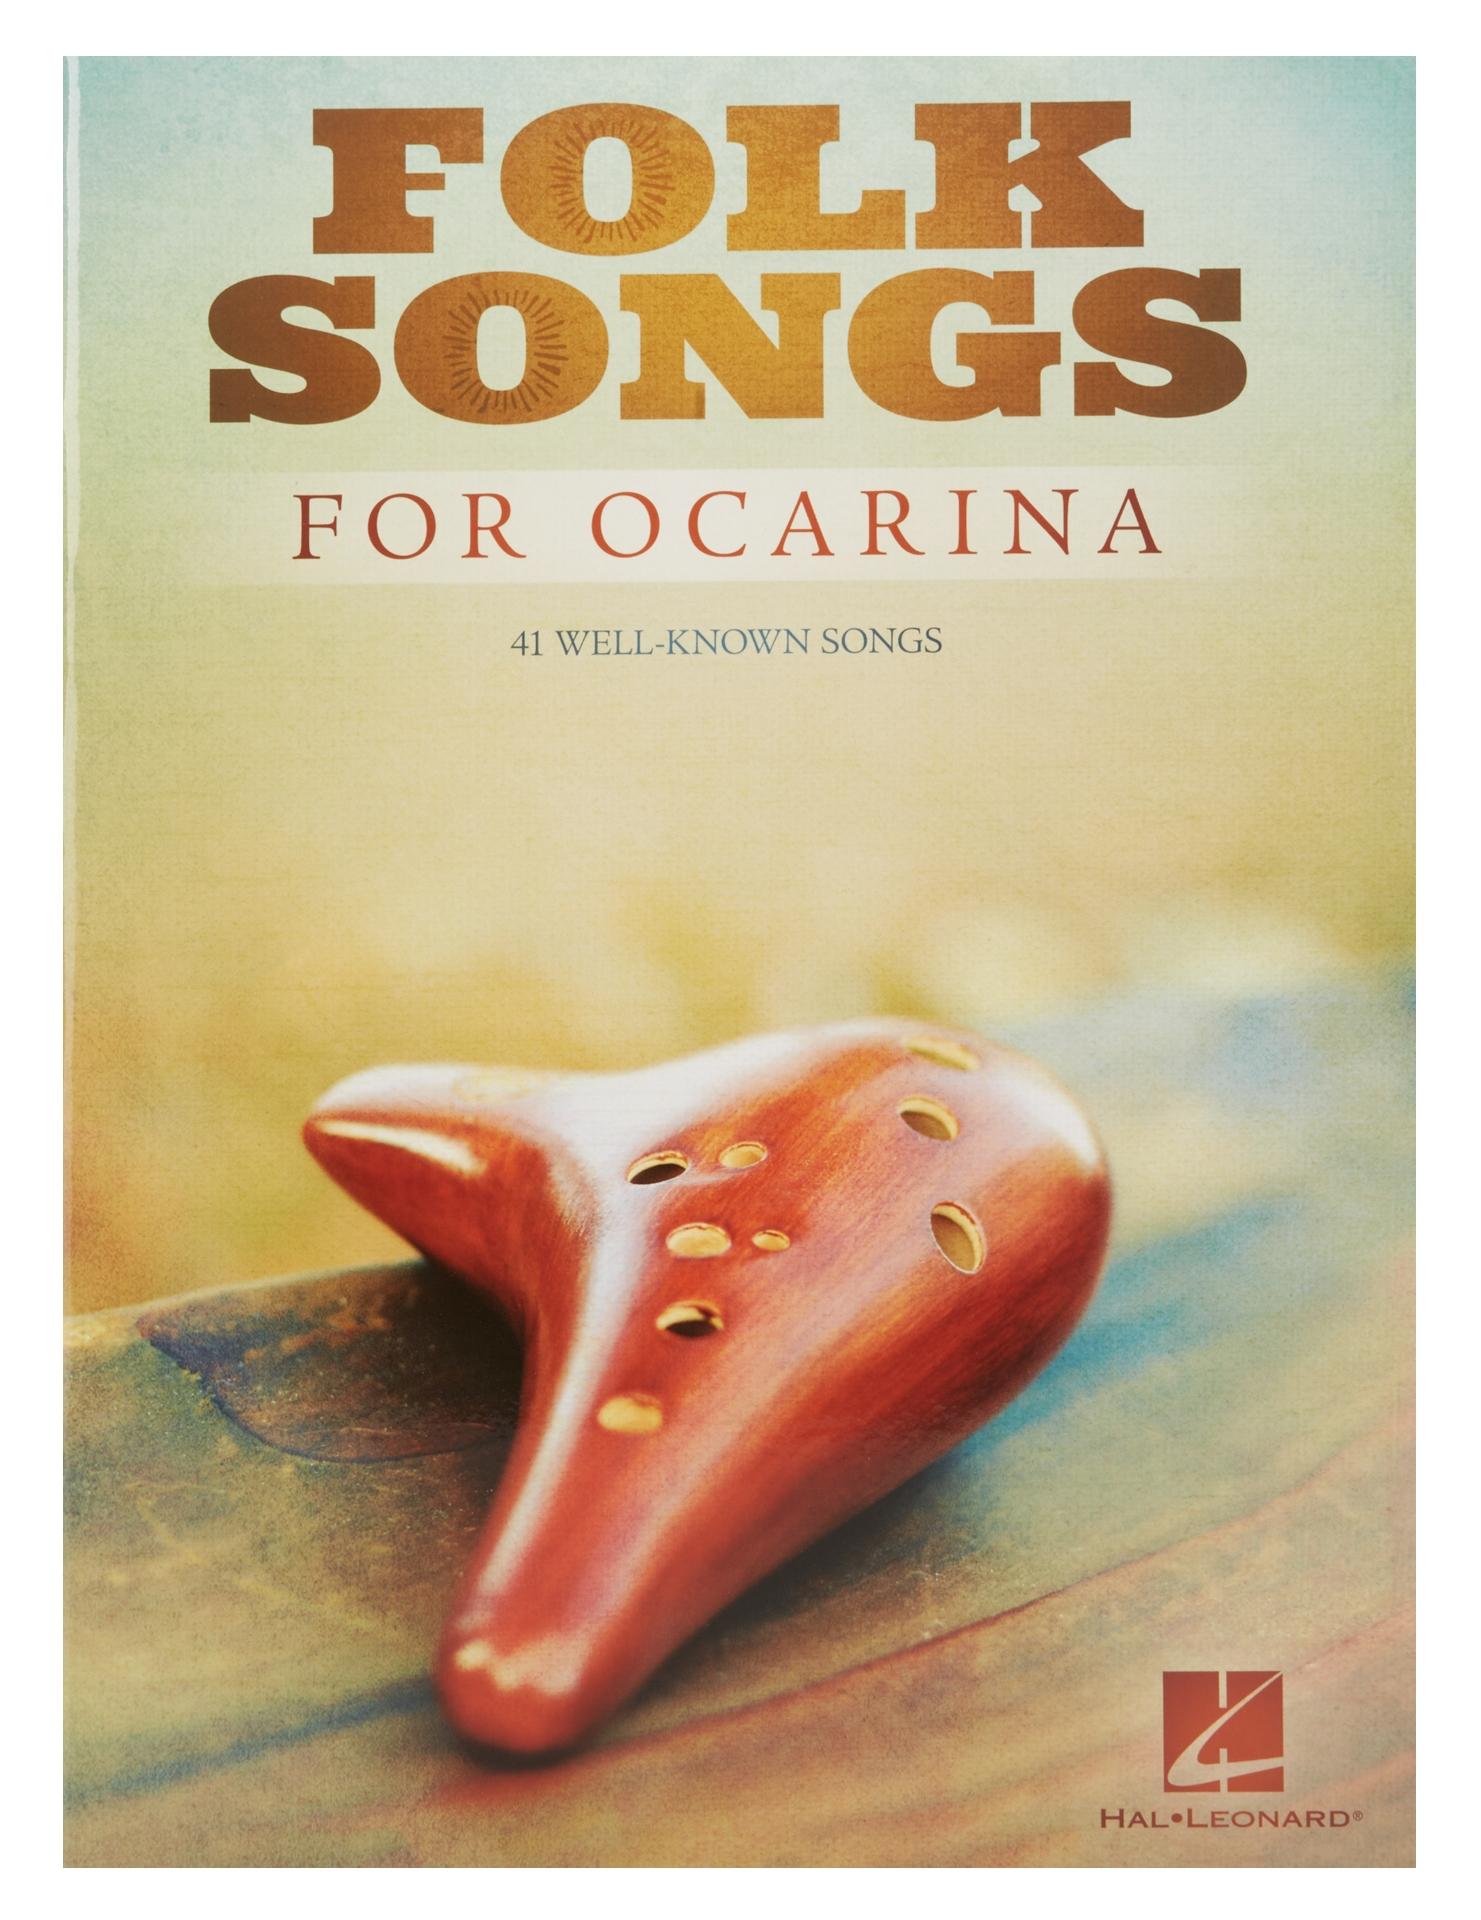 MS Folk Songs For Ocarina